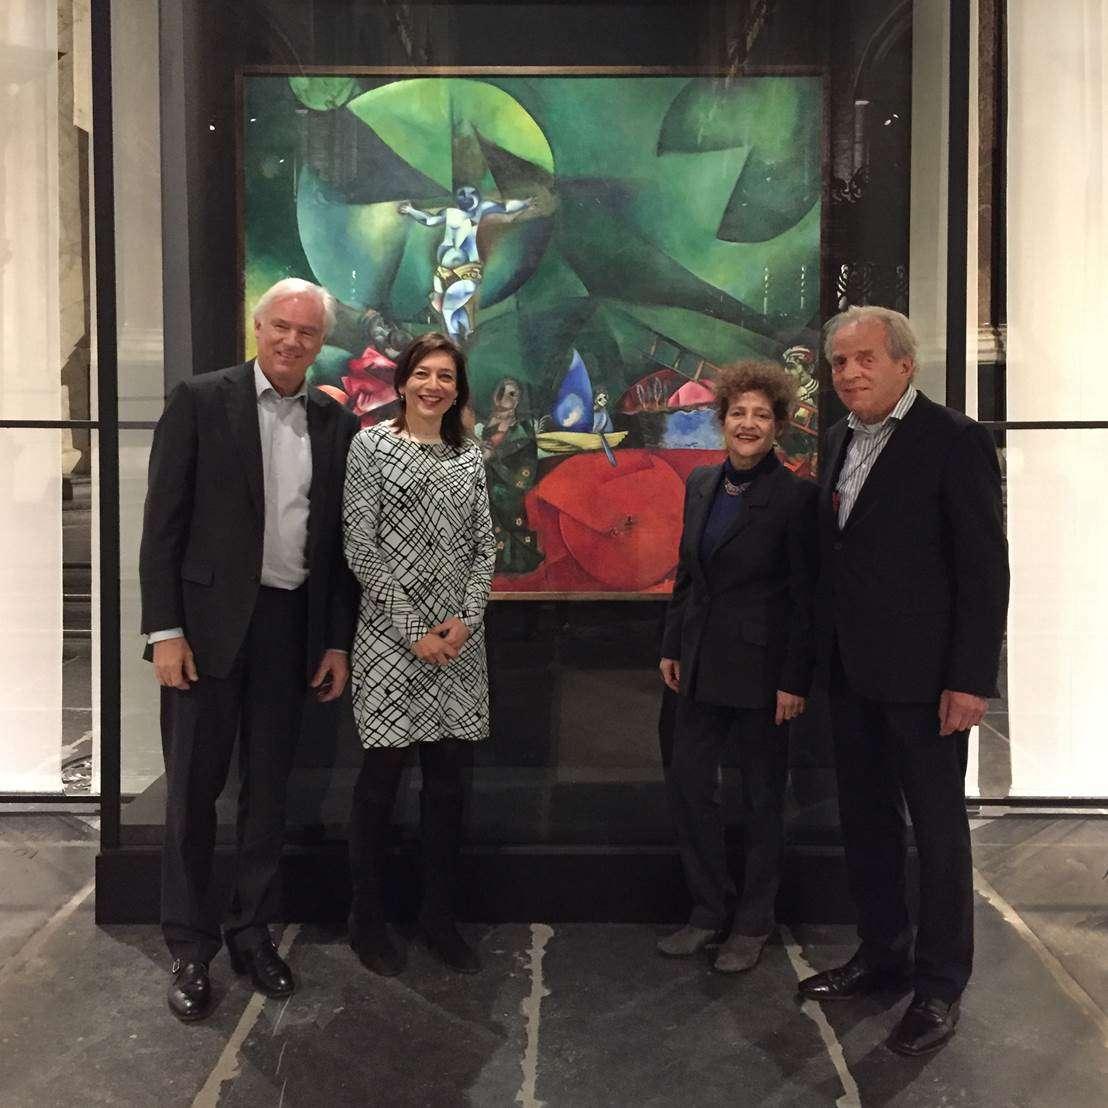 Kleindochter Chagall verrast met onverwacht bezoek